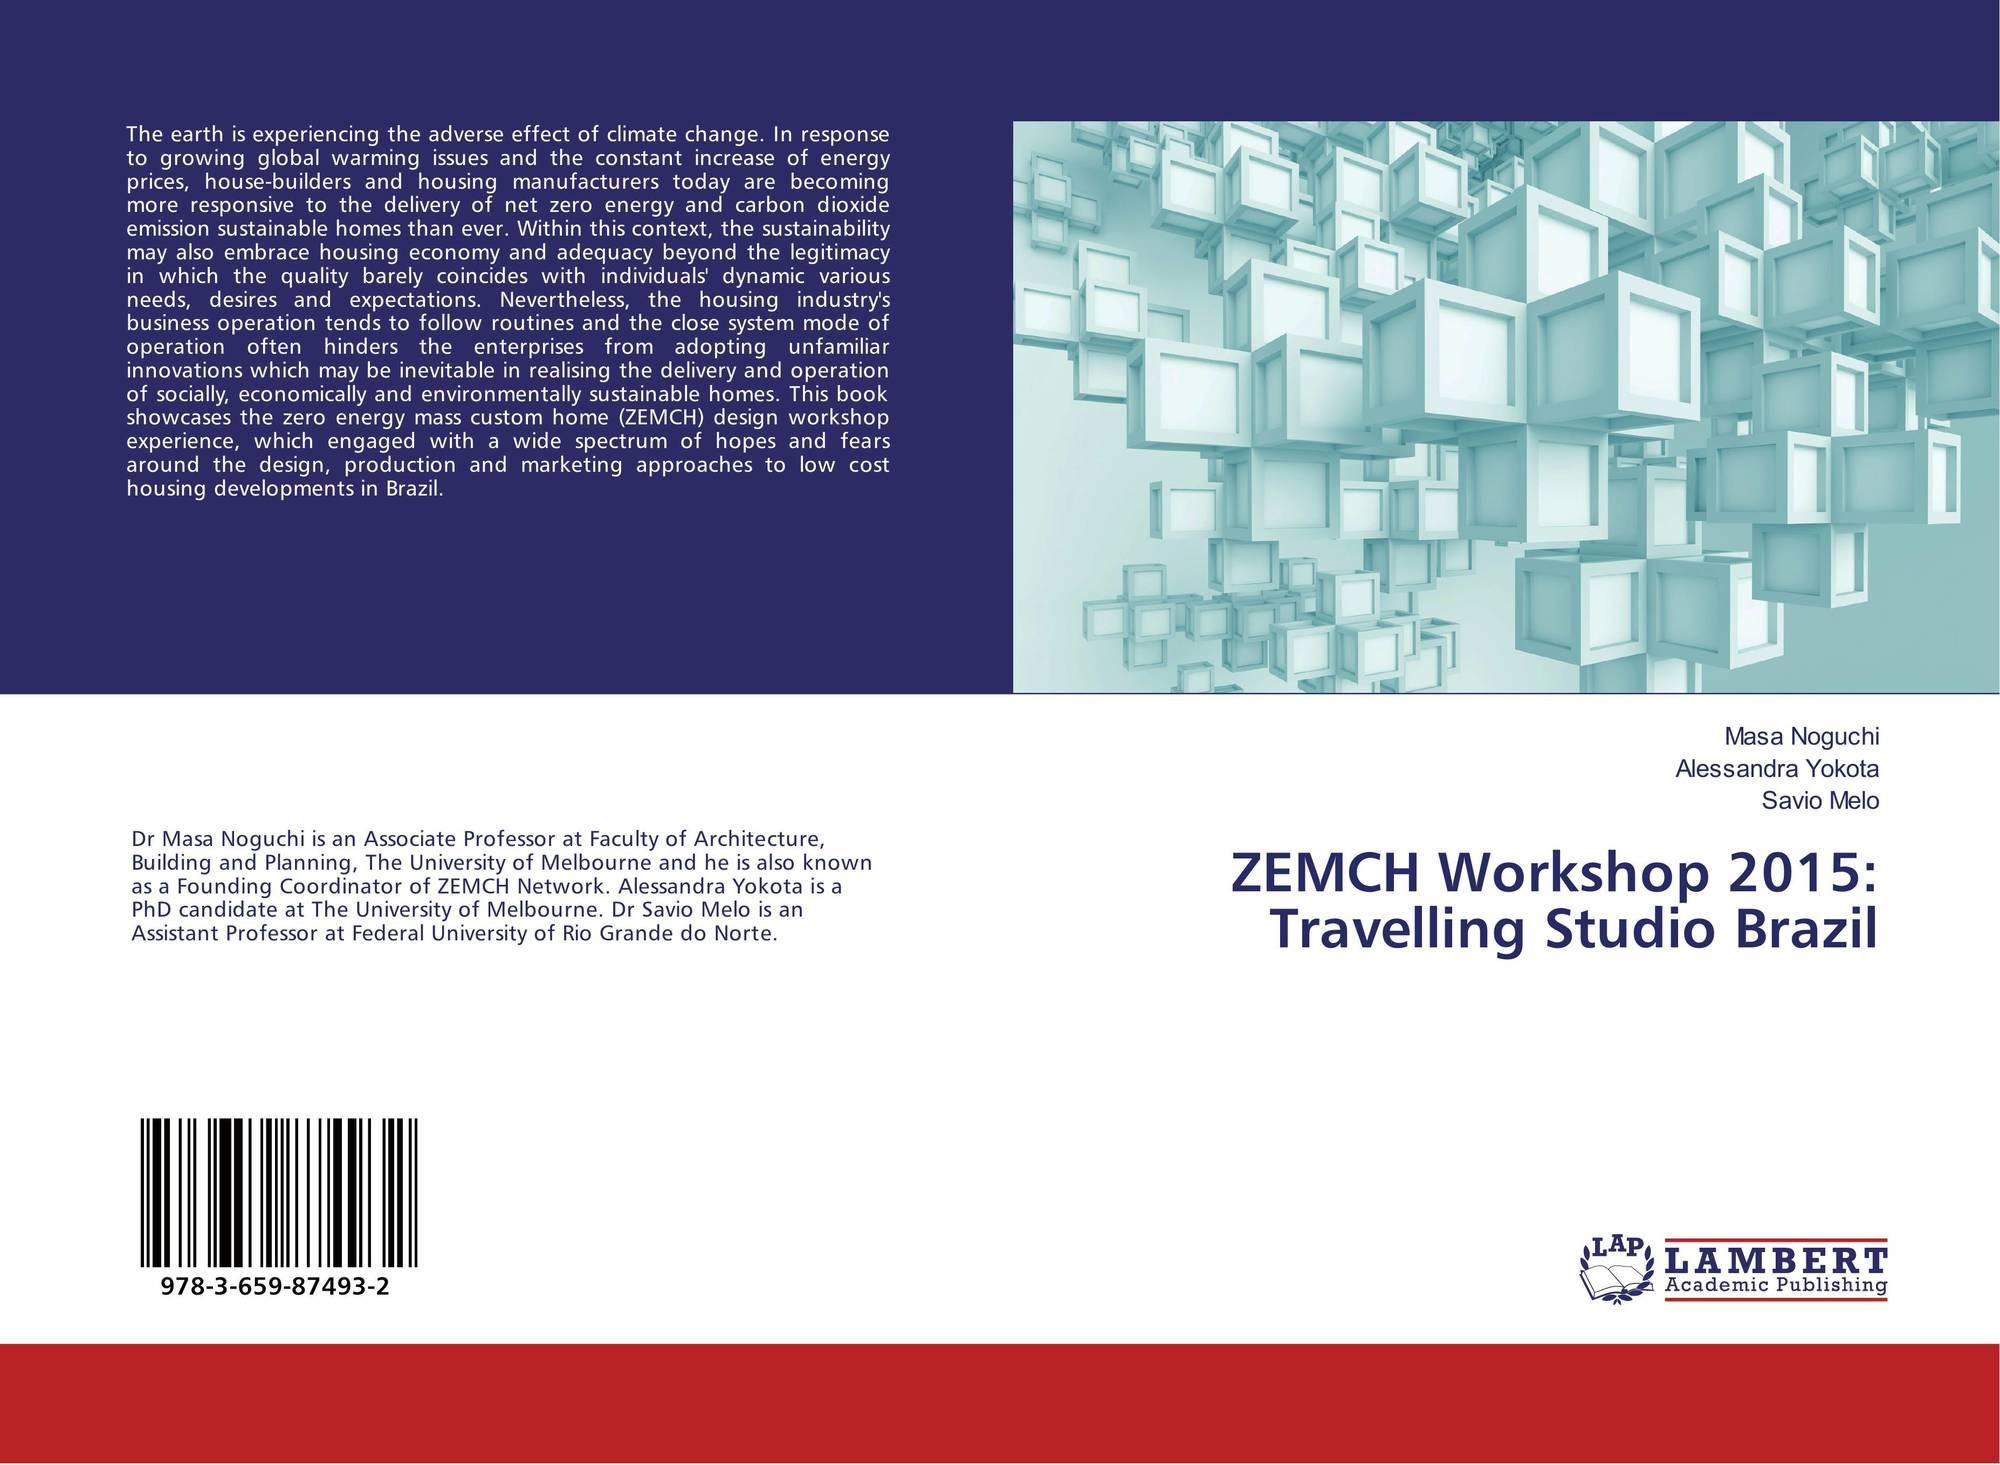 Category/education - Bookcover Of Zemch Workshop 2015 Travelling Studio Brazil